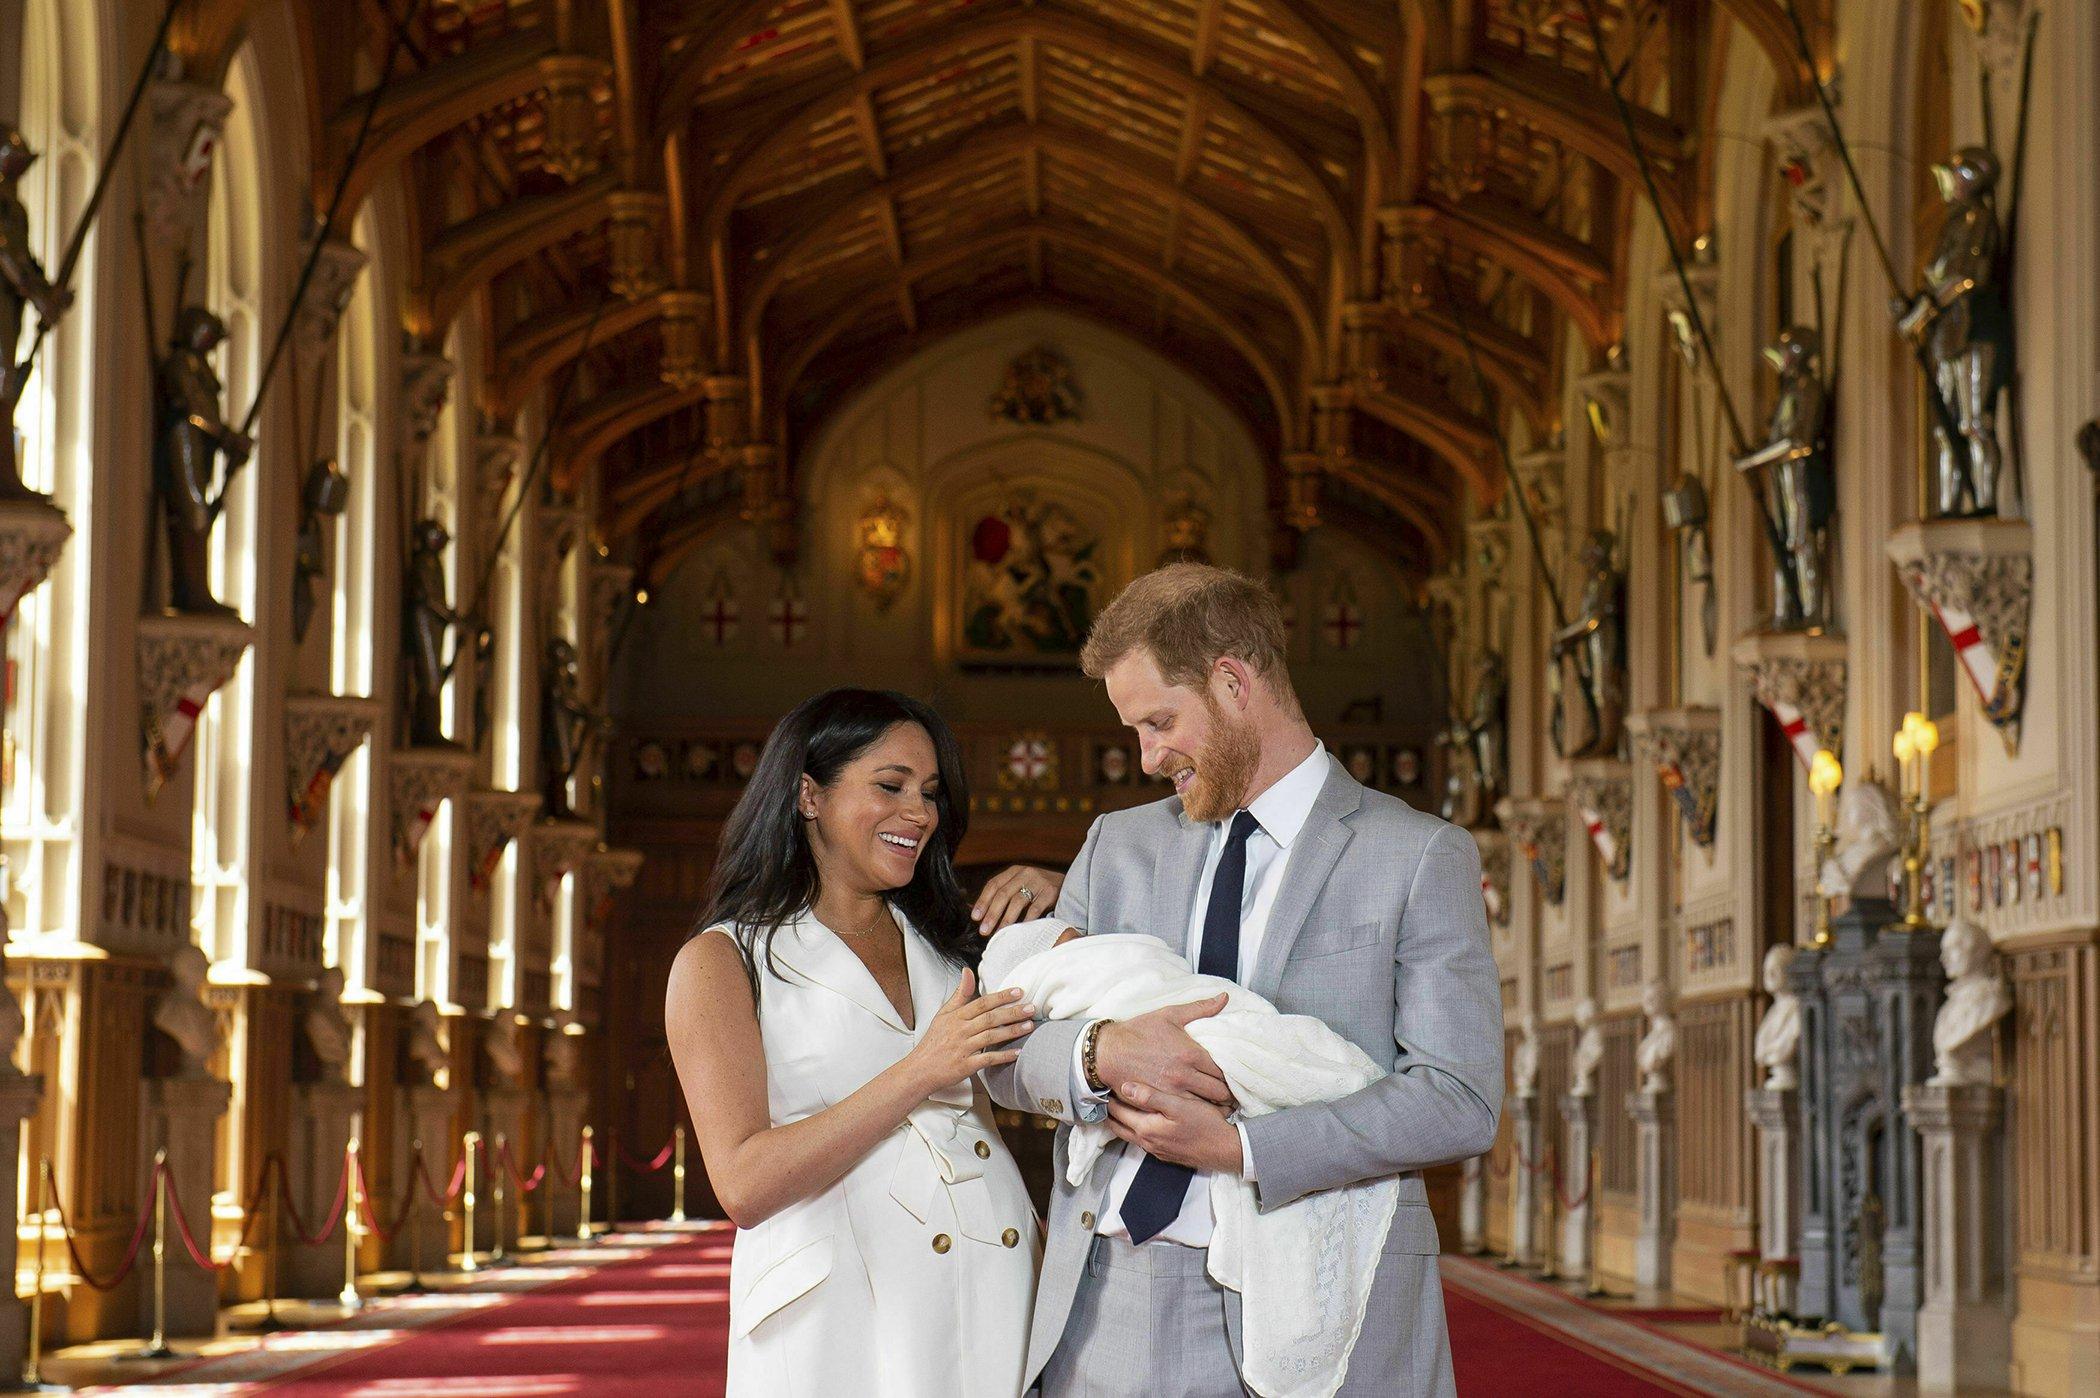 Prince-Harry-Meghan-Markle-Baby-Archie.jpg